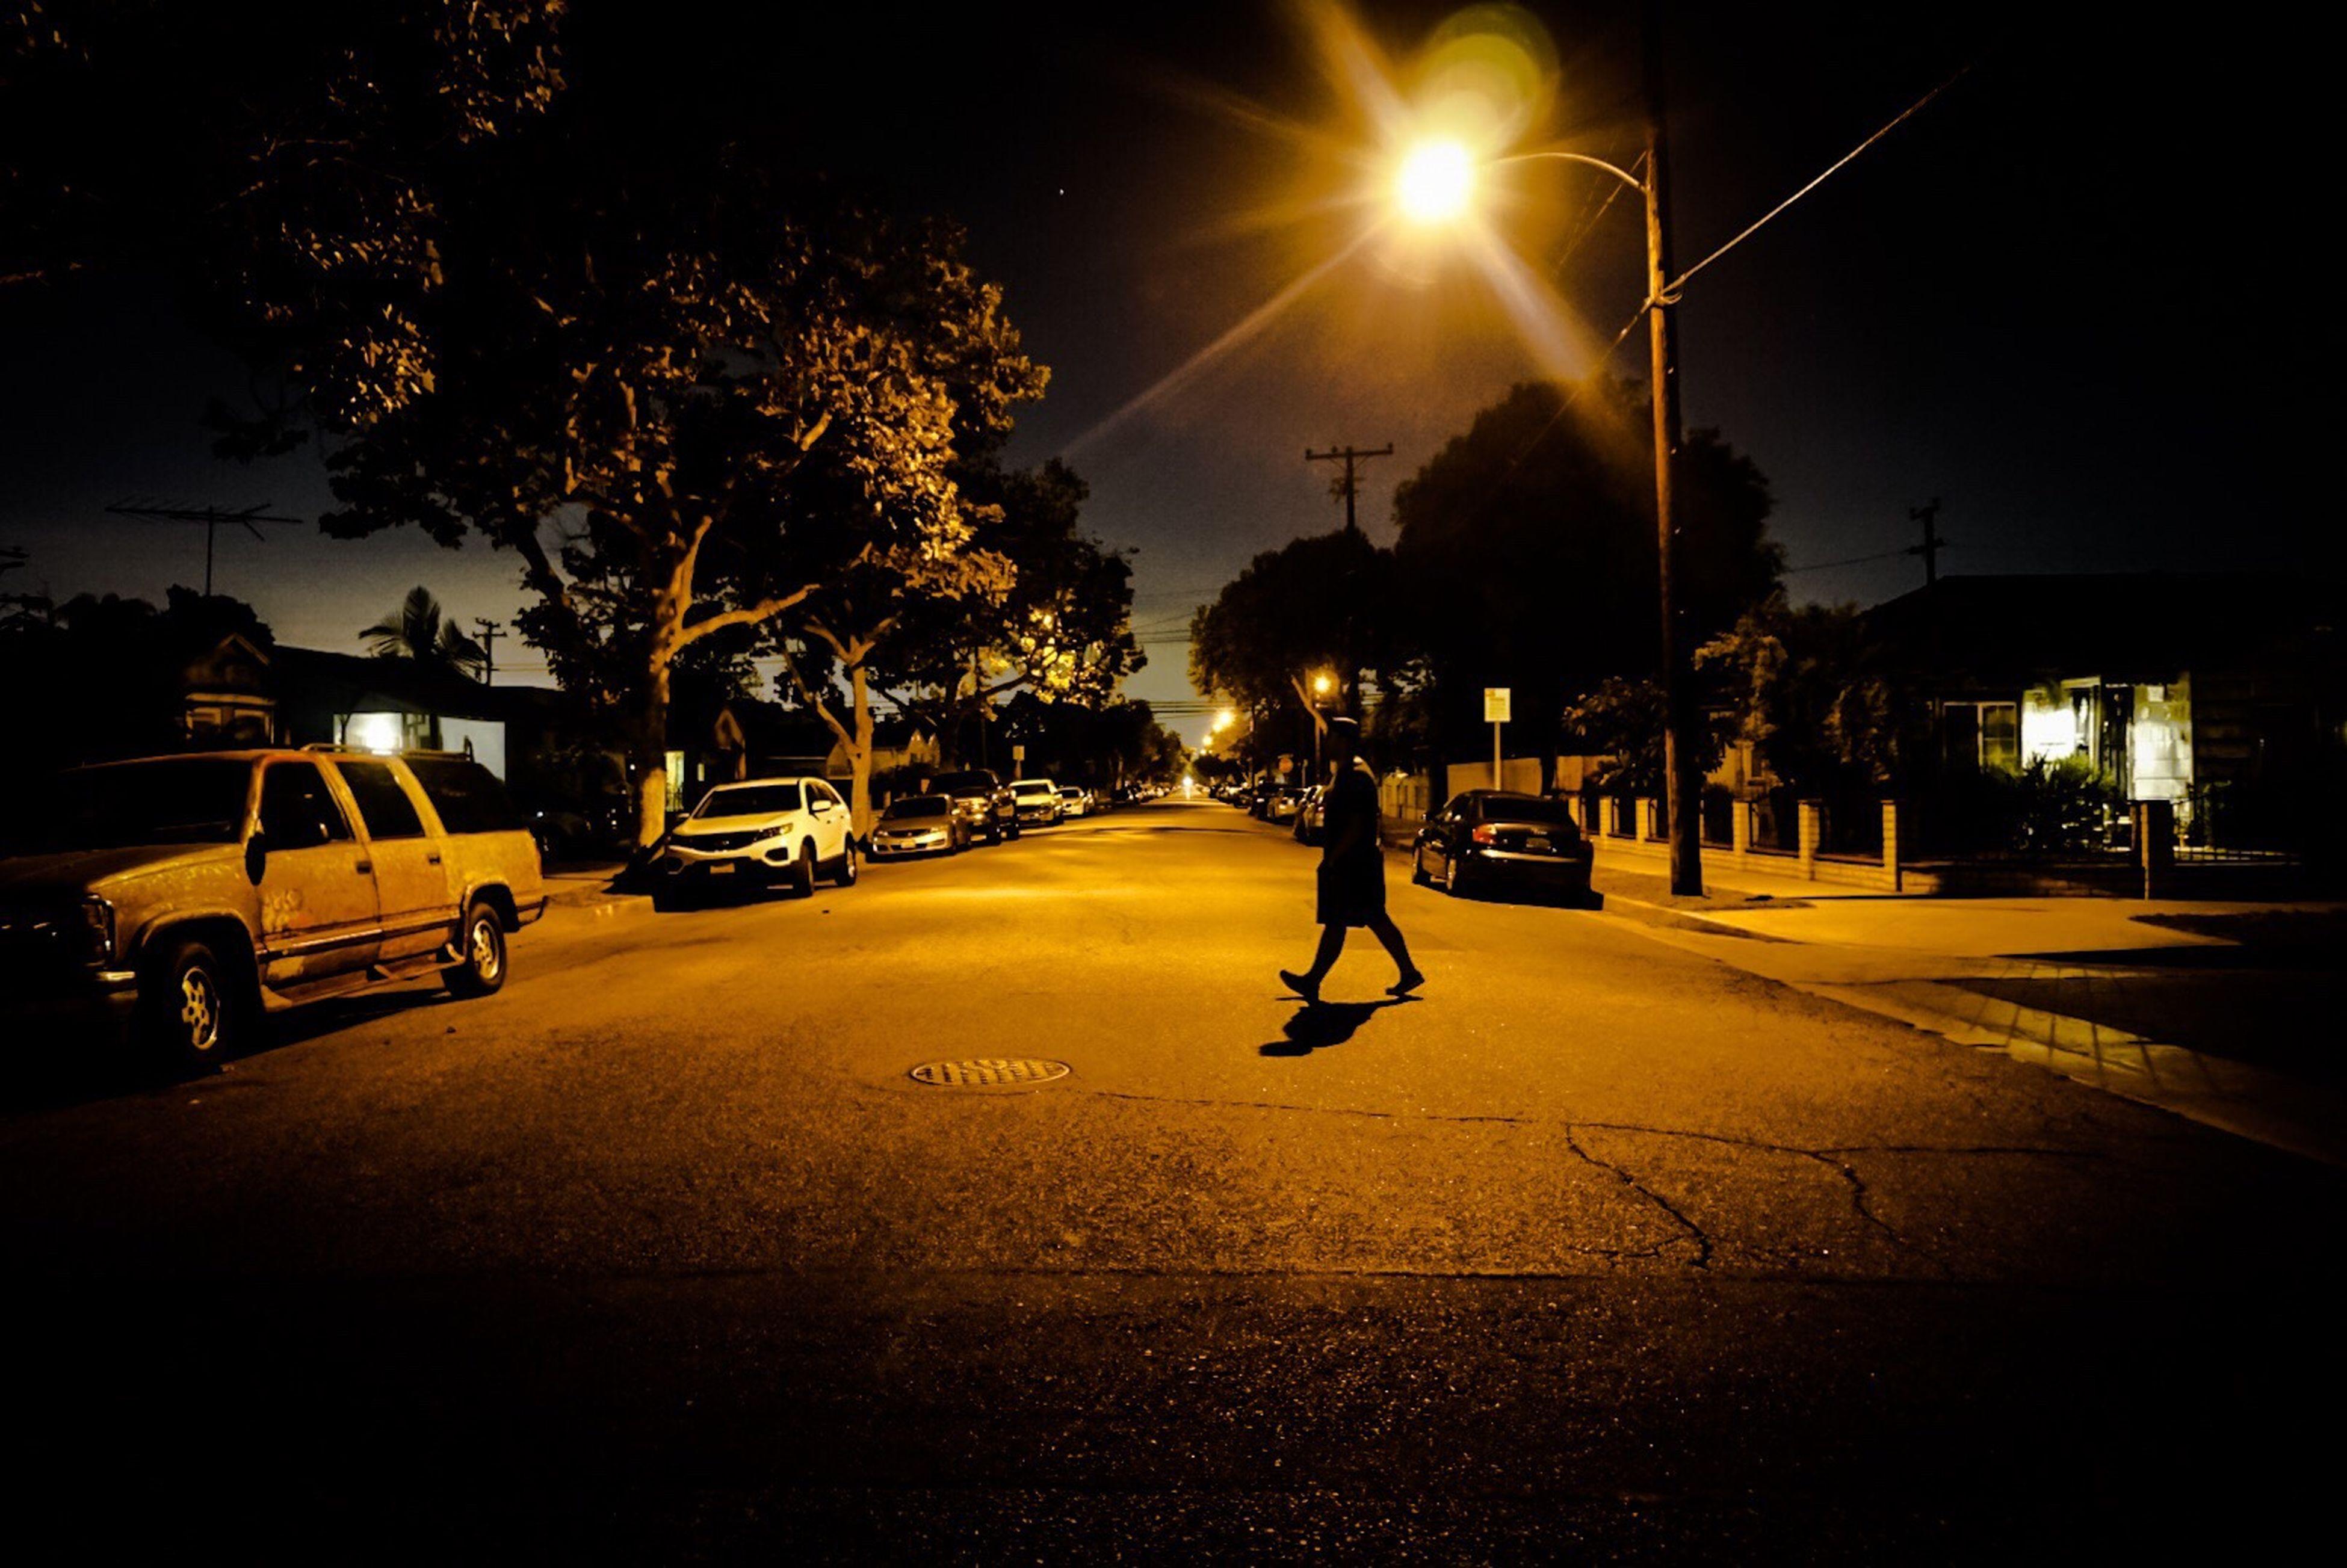 street, tree, full length, road, car, transportation, night, walking, illuminated, land vehicle, lens flare, sunbeam, outdoors, sky, light beam, city life